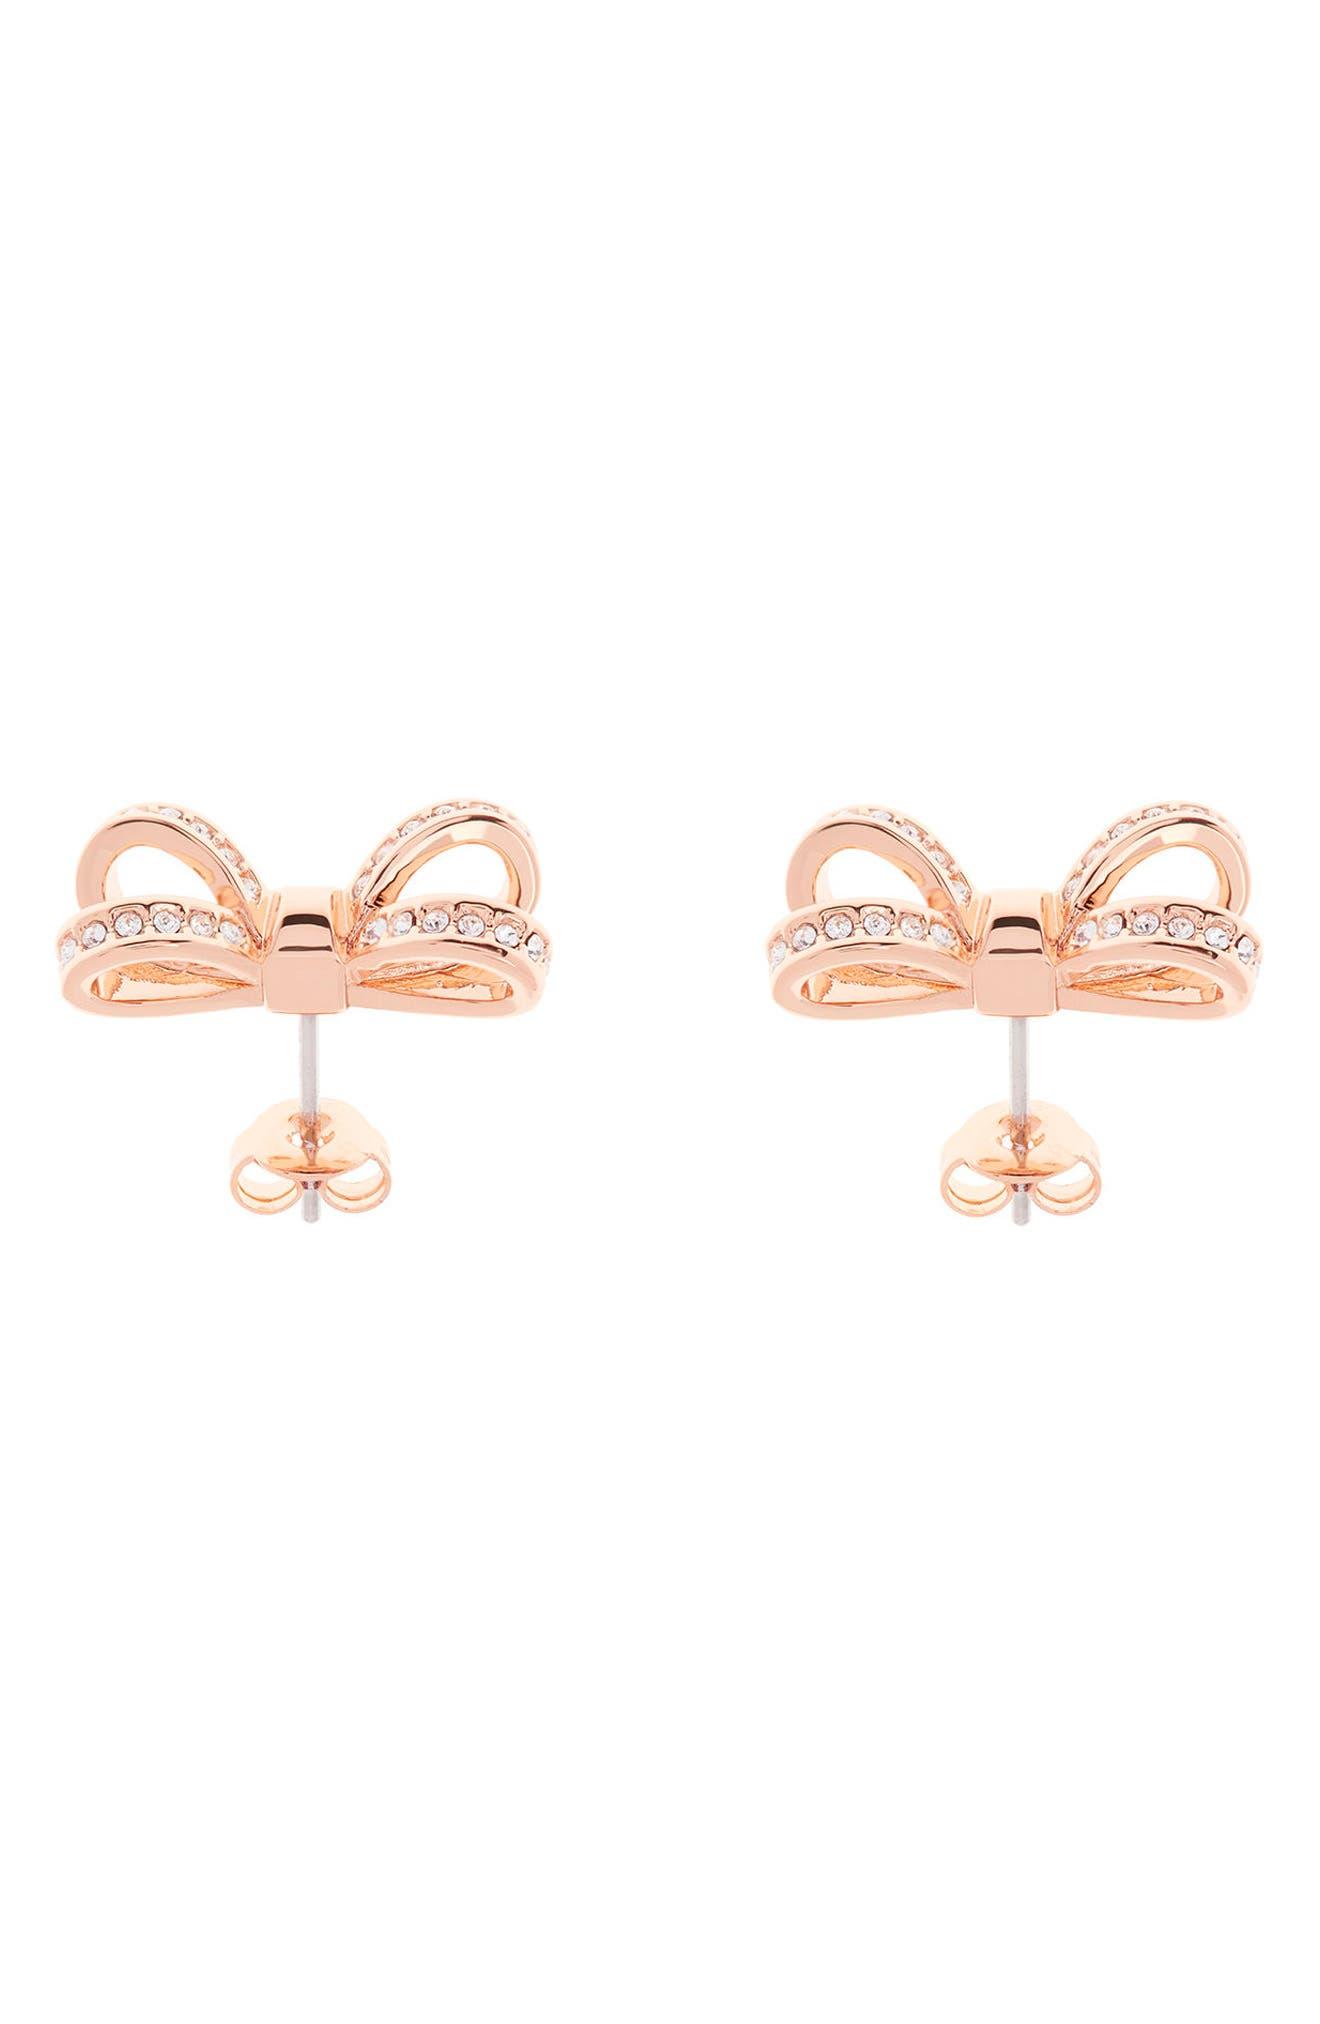 Mini Opulent Pavé Bow Stud Earrings,                             Alternate thumbnail 2, color,                             Rose Gold